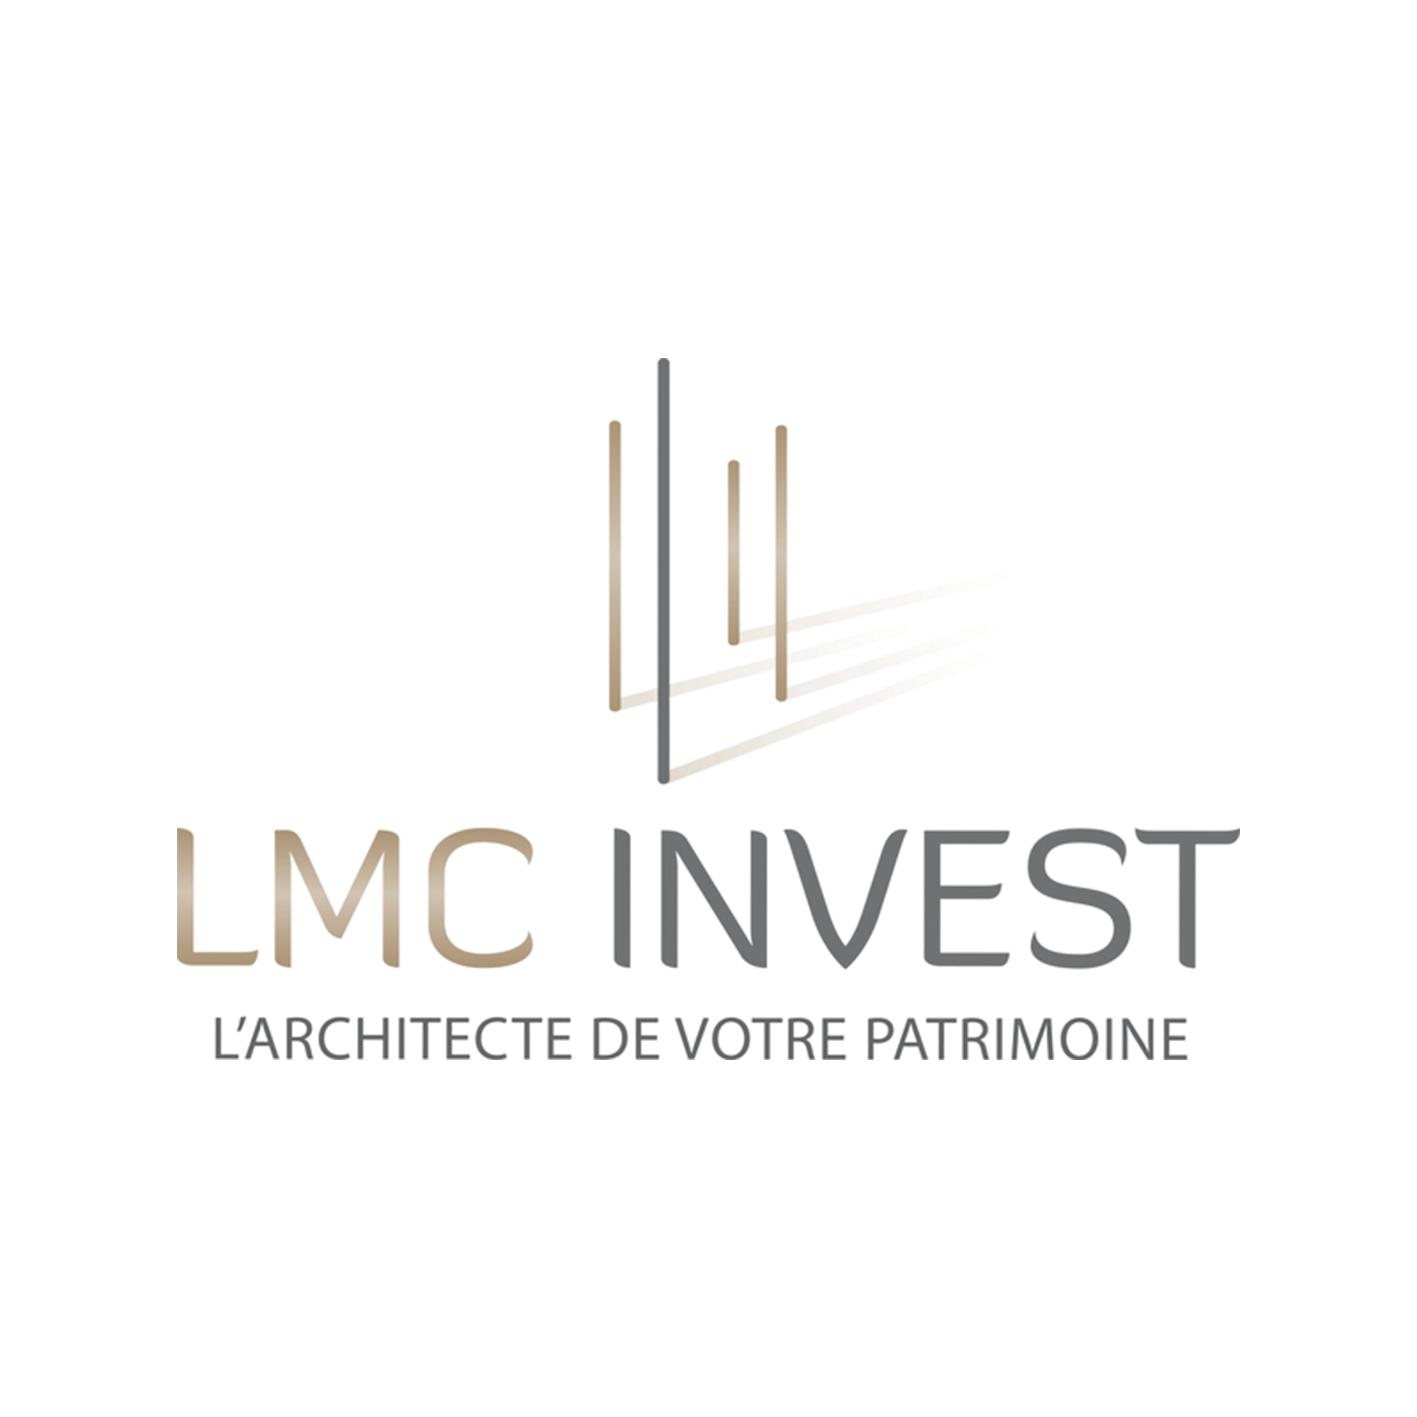 logo-lmc-invest